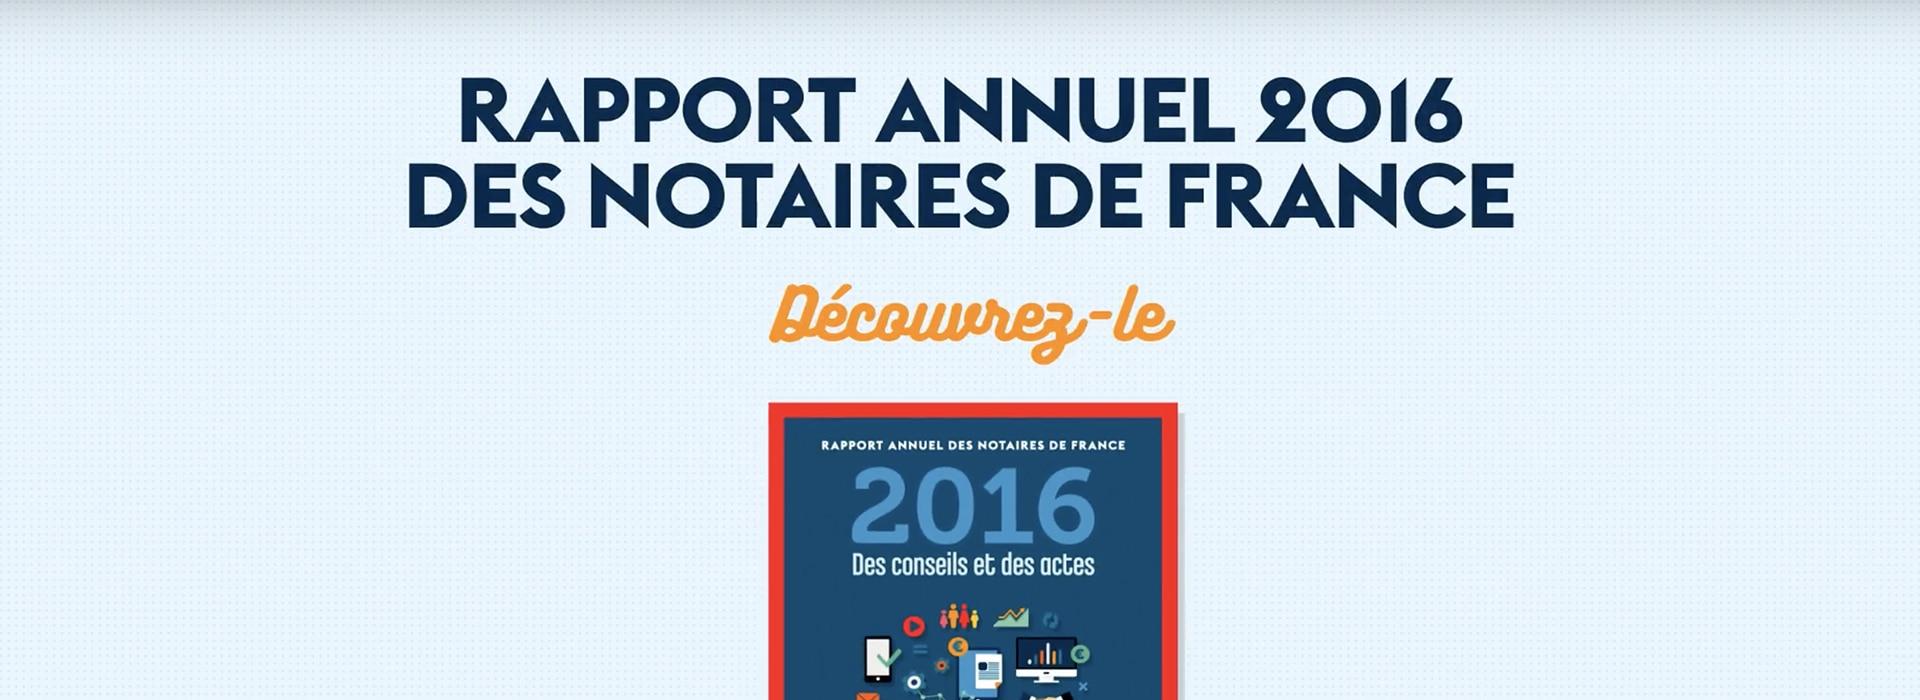 image site rapport annuel